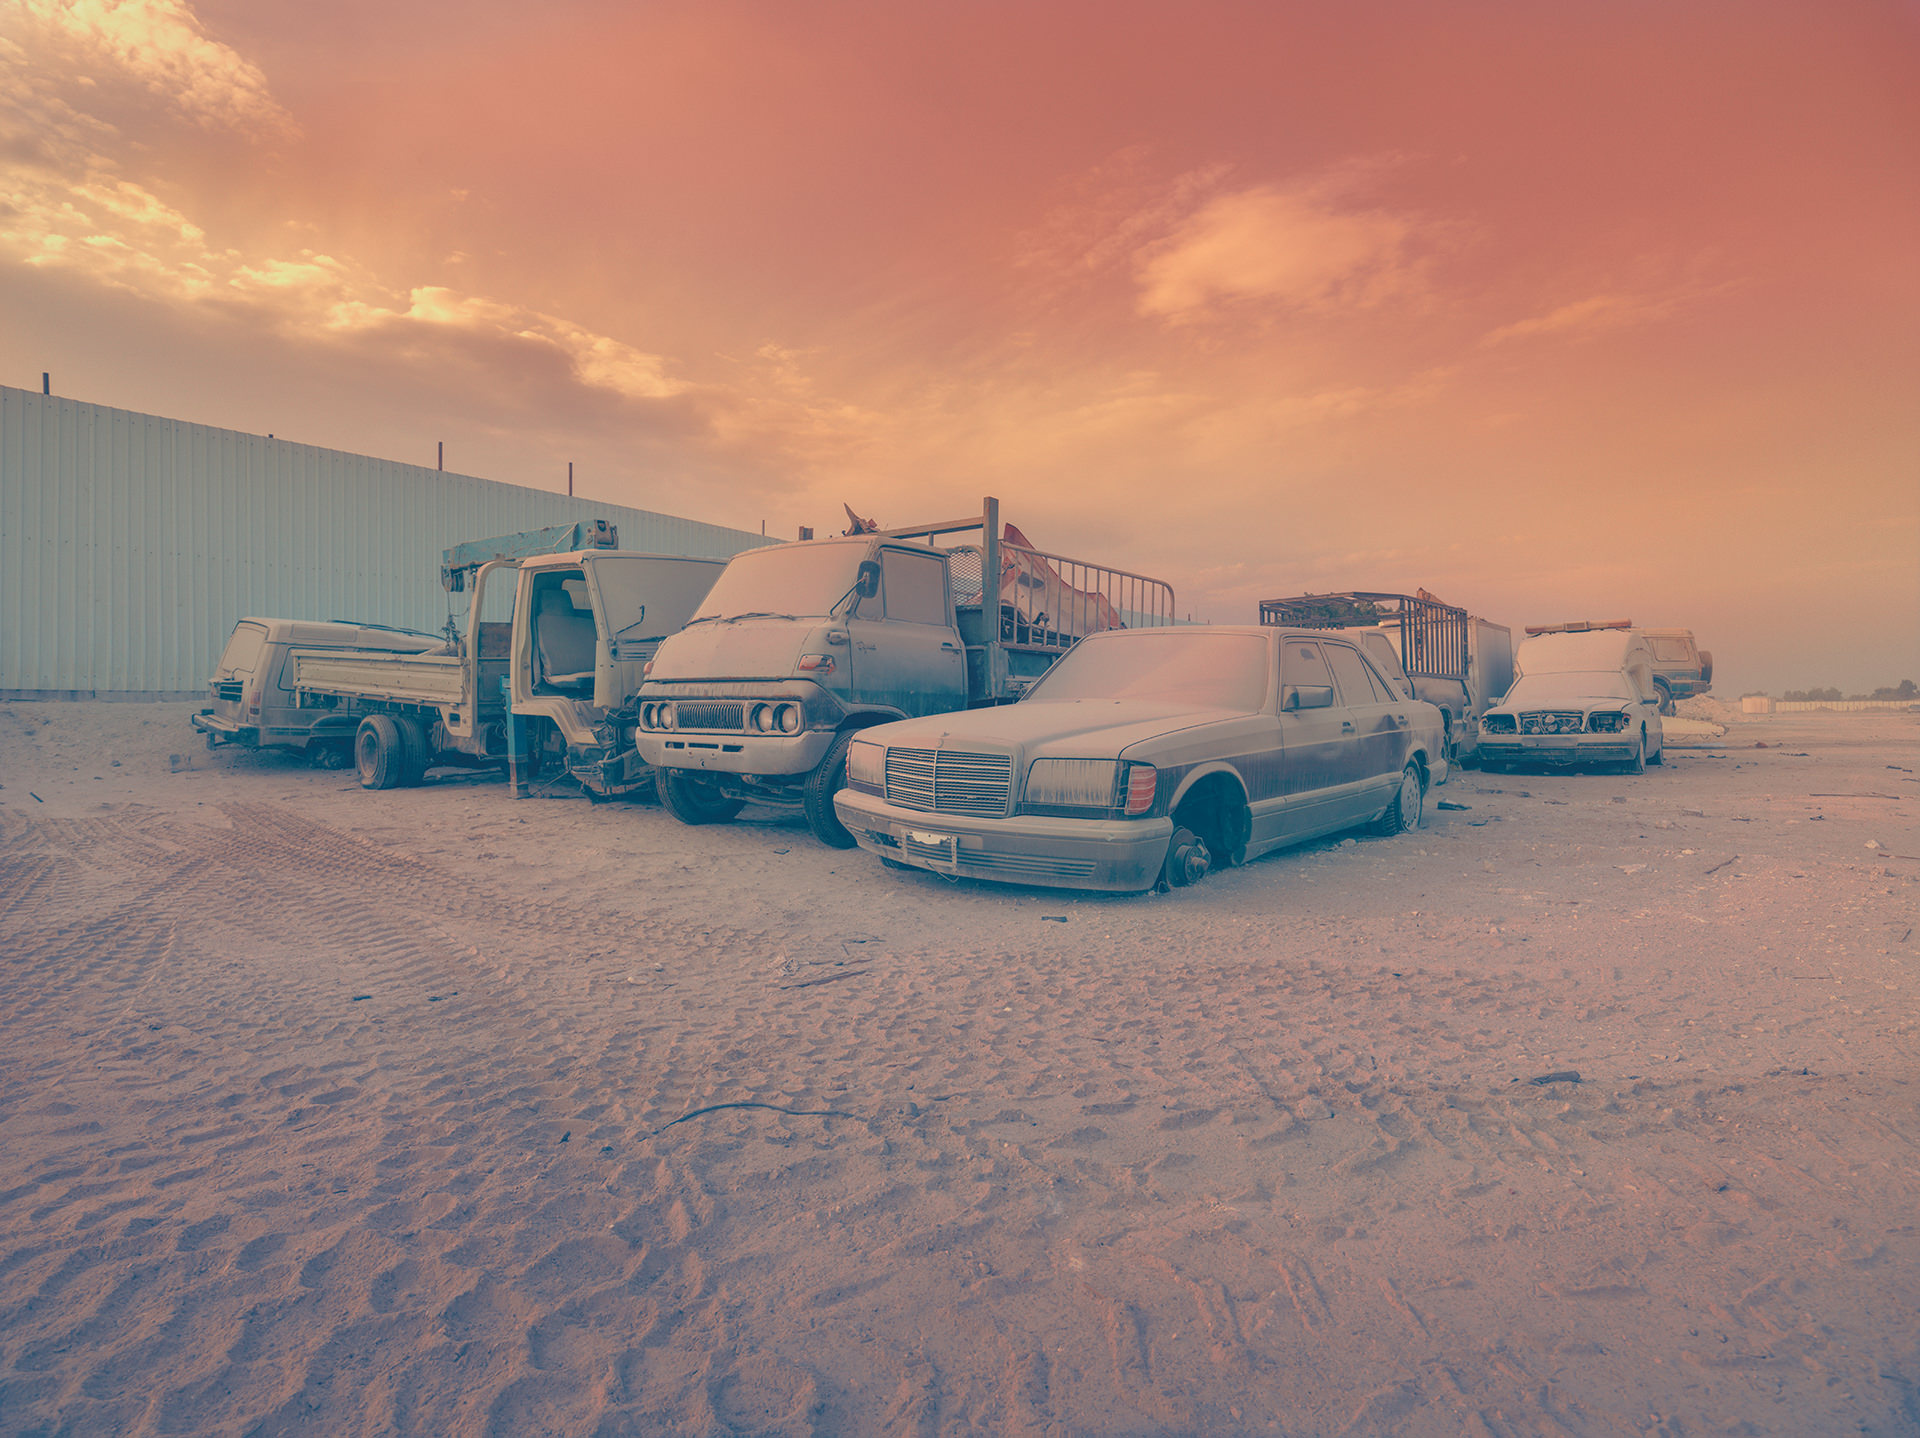 2014; bahrain; dust, junk yard, cars; transportation, old, anke luckmann